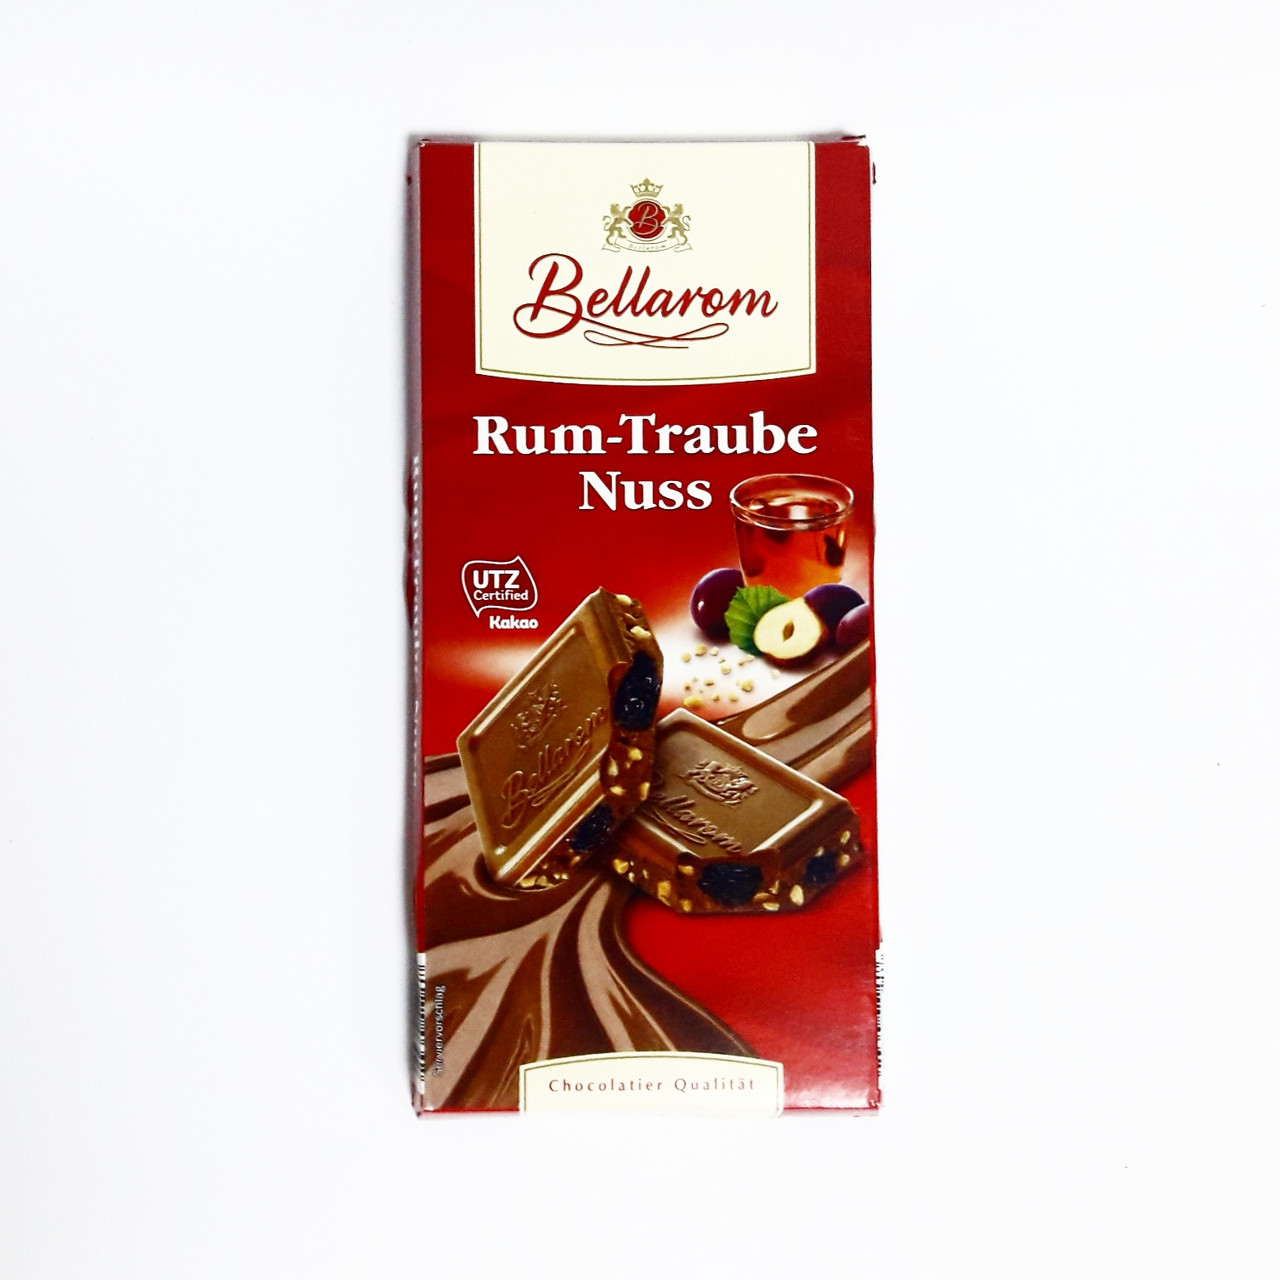 Шоколад BellaromRum Traube Nuss молочный изюм+ром+орех 200г